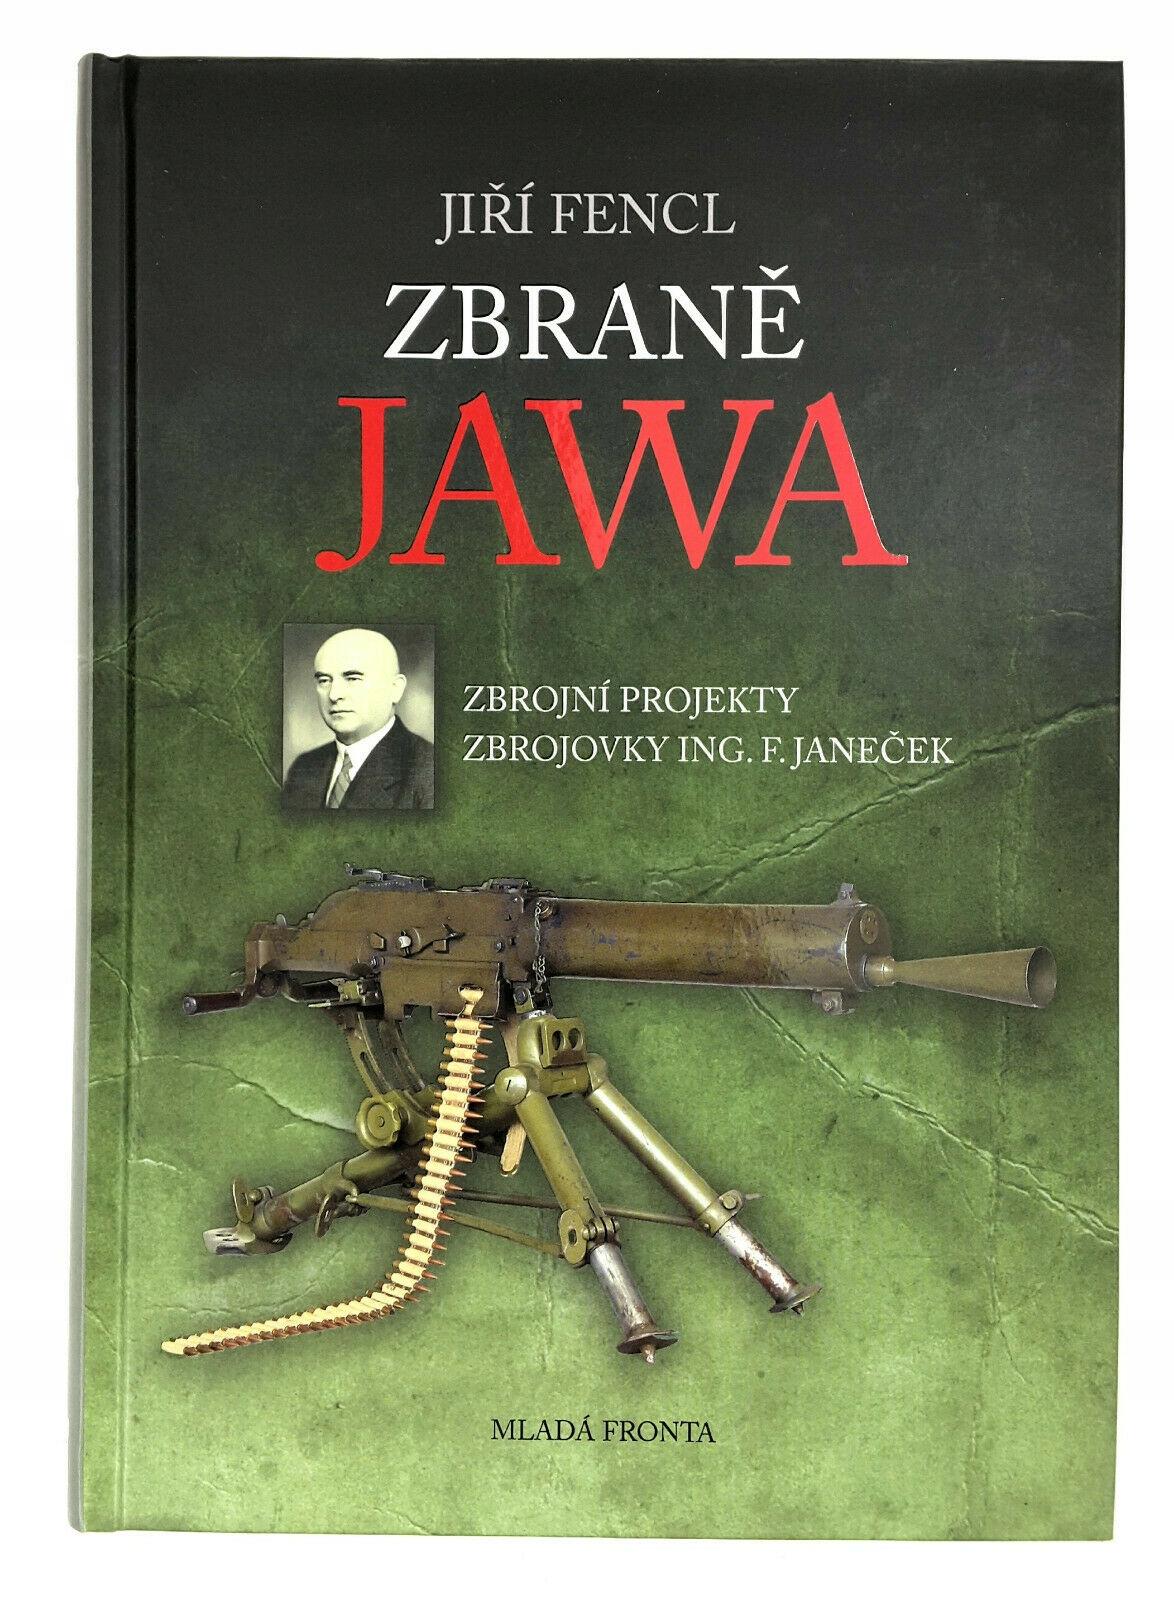 Чешское оружие винтовка пистолет мотоцикл JAWA